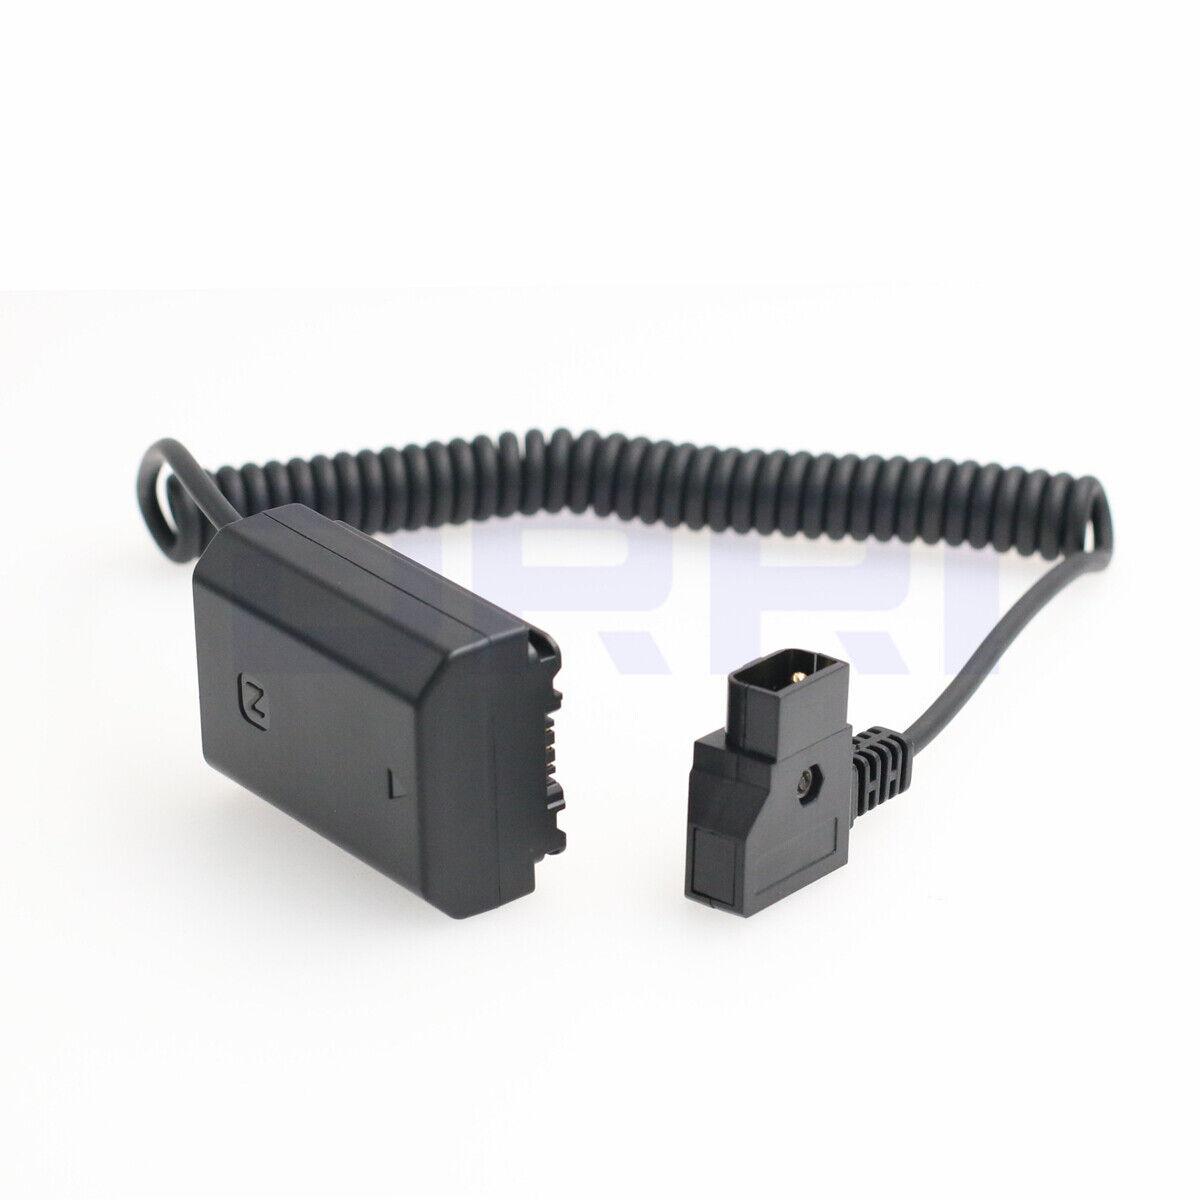 NP-FZ100 Dummy Battery to Dtap for Sony A9 A7R3 A7M3 A7S3 A7III A7 A7SM3